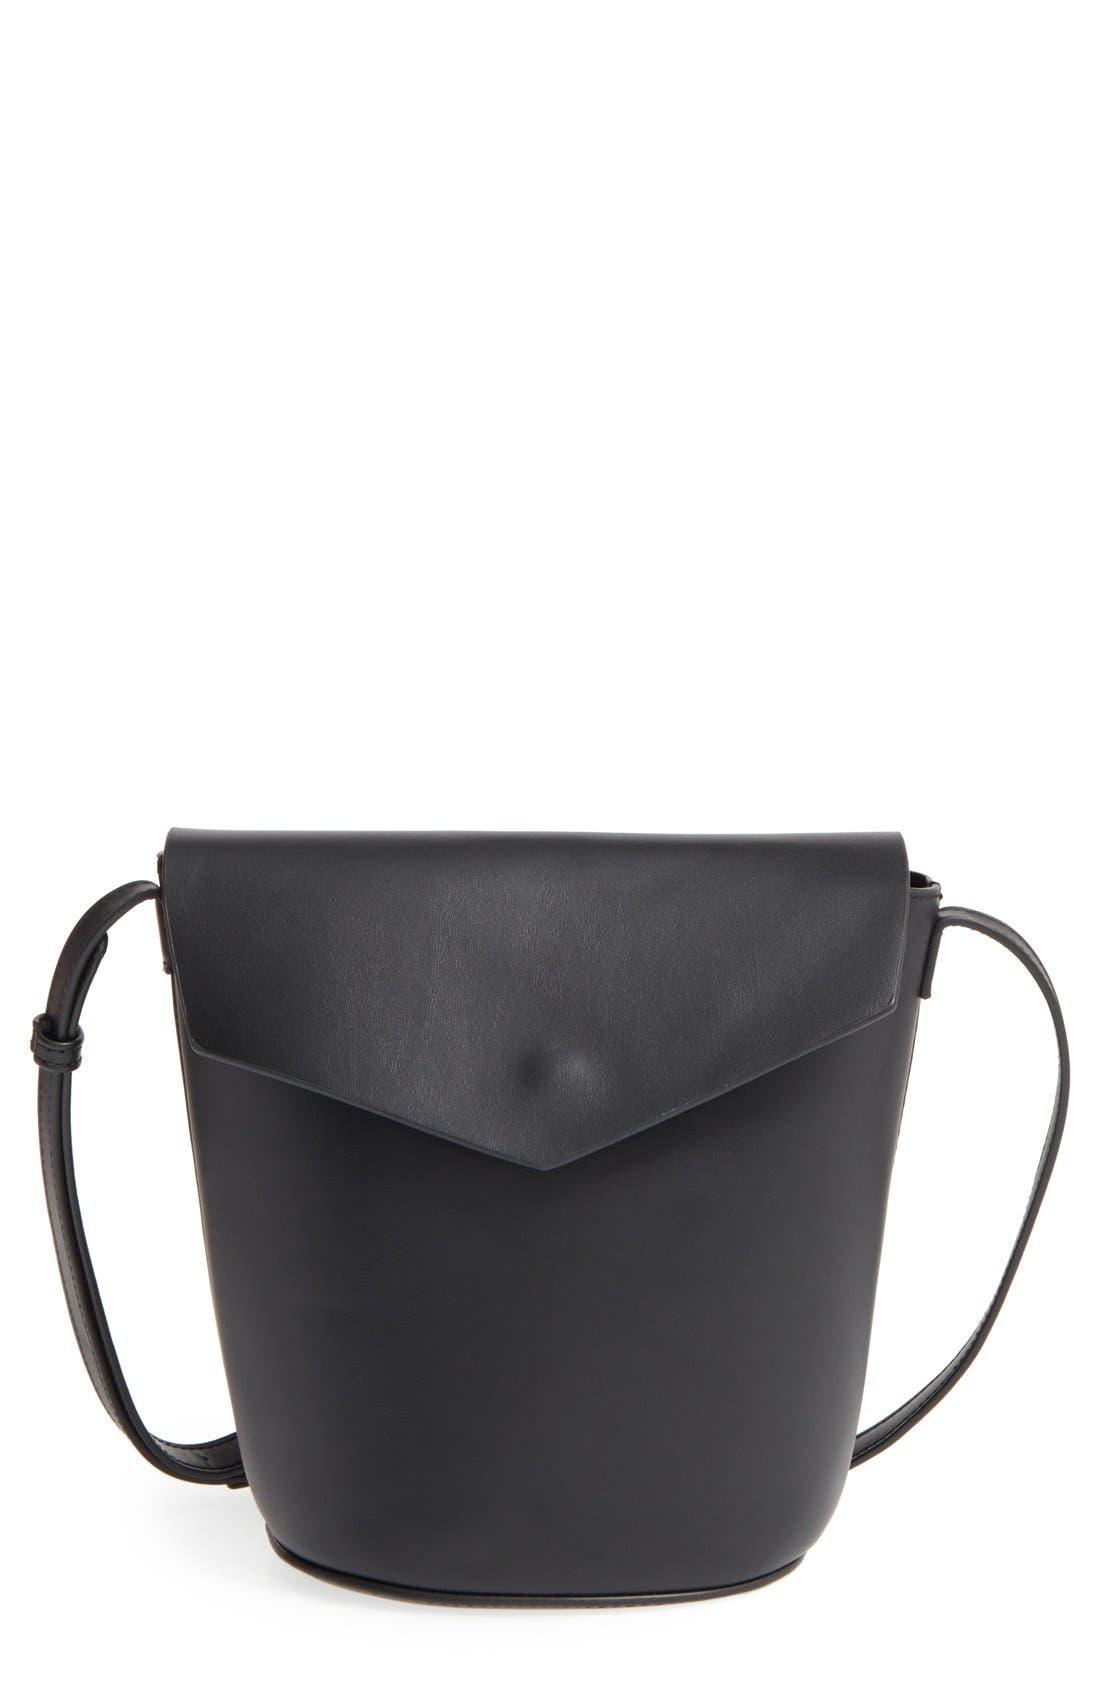 Alternate Image 1 Selected - Street Level Faux Leather Envelope Bucket Bag